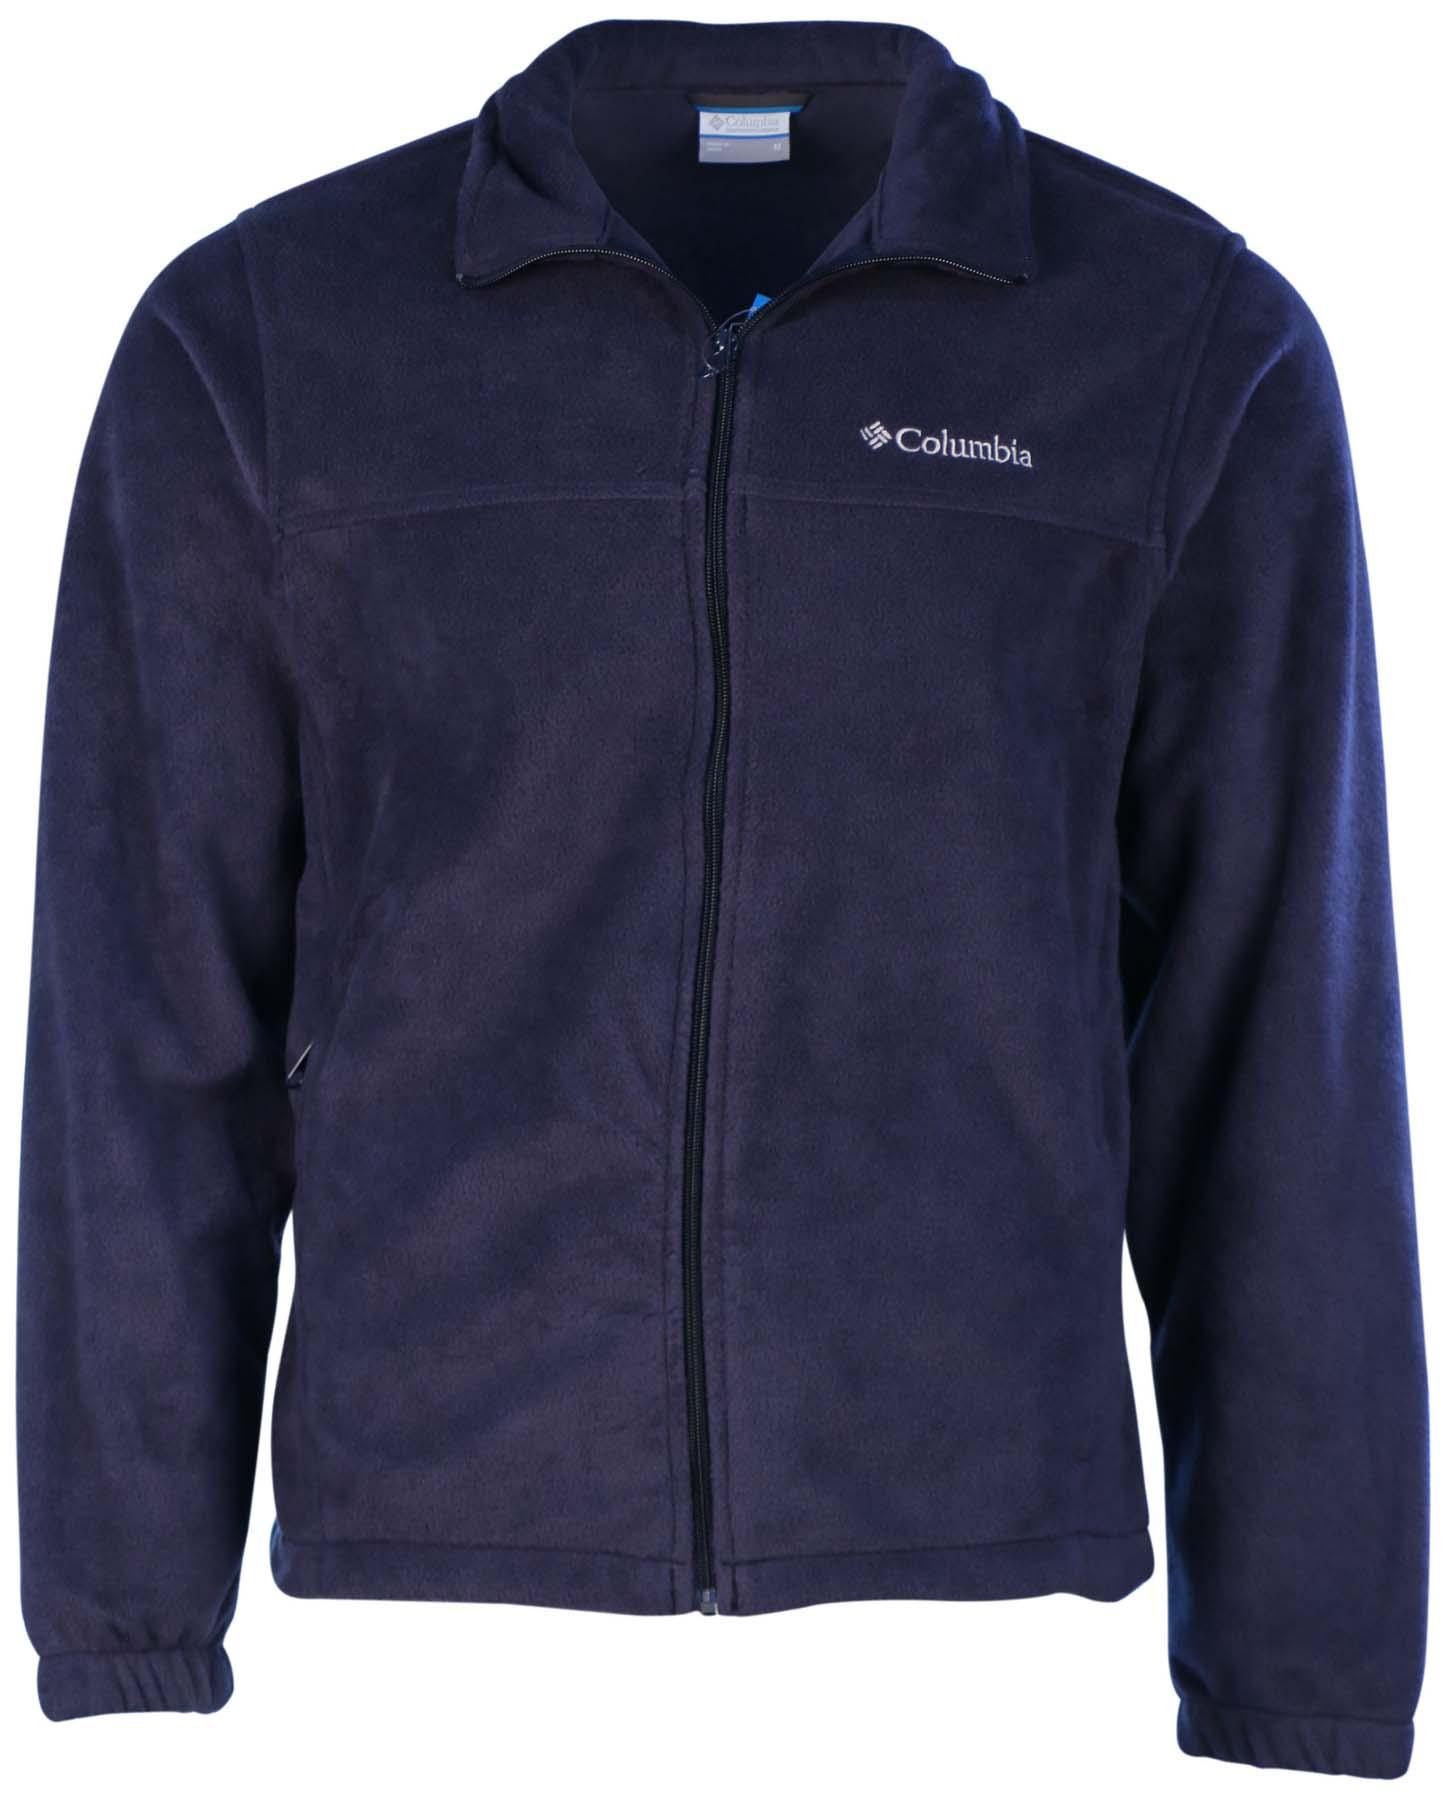 Columbia Men's Granite Mountain Fleece Jacket M Navy Blue | eBay